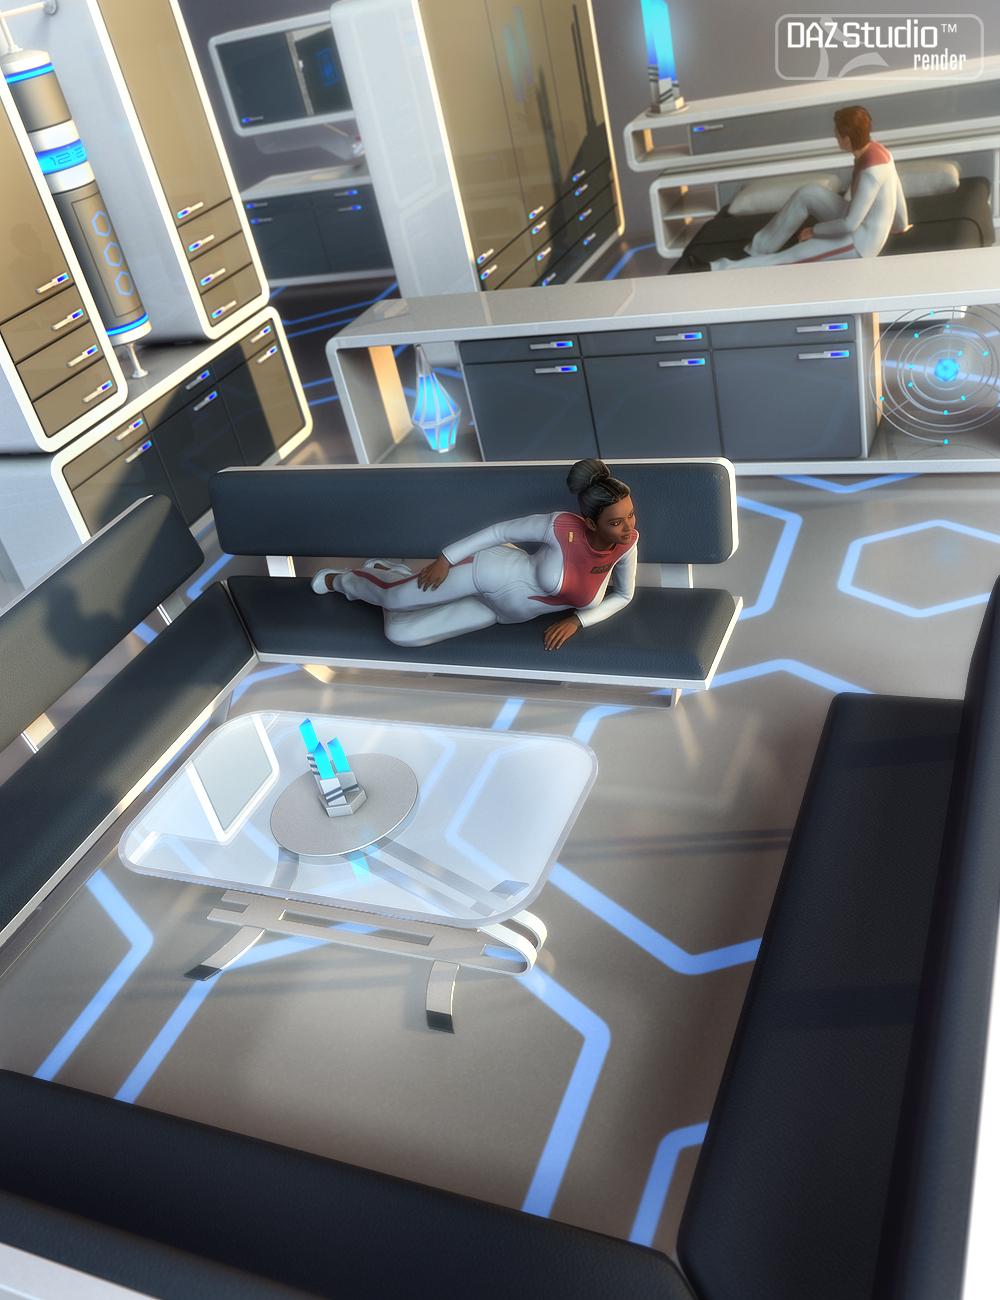 Sci-fi Outpost Props by: petipet, 3D Models by Daz 3D